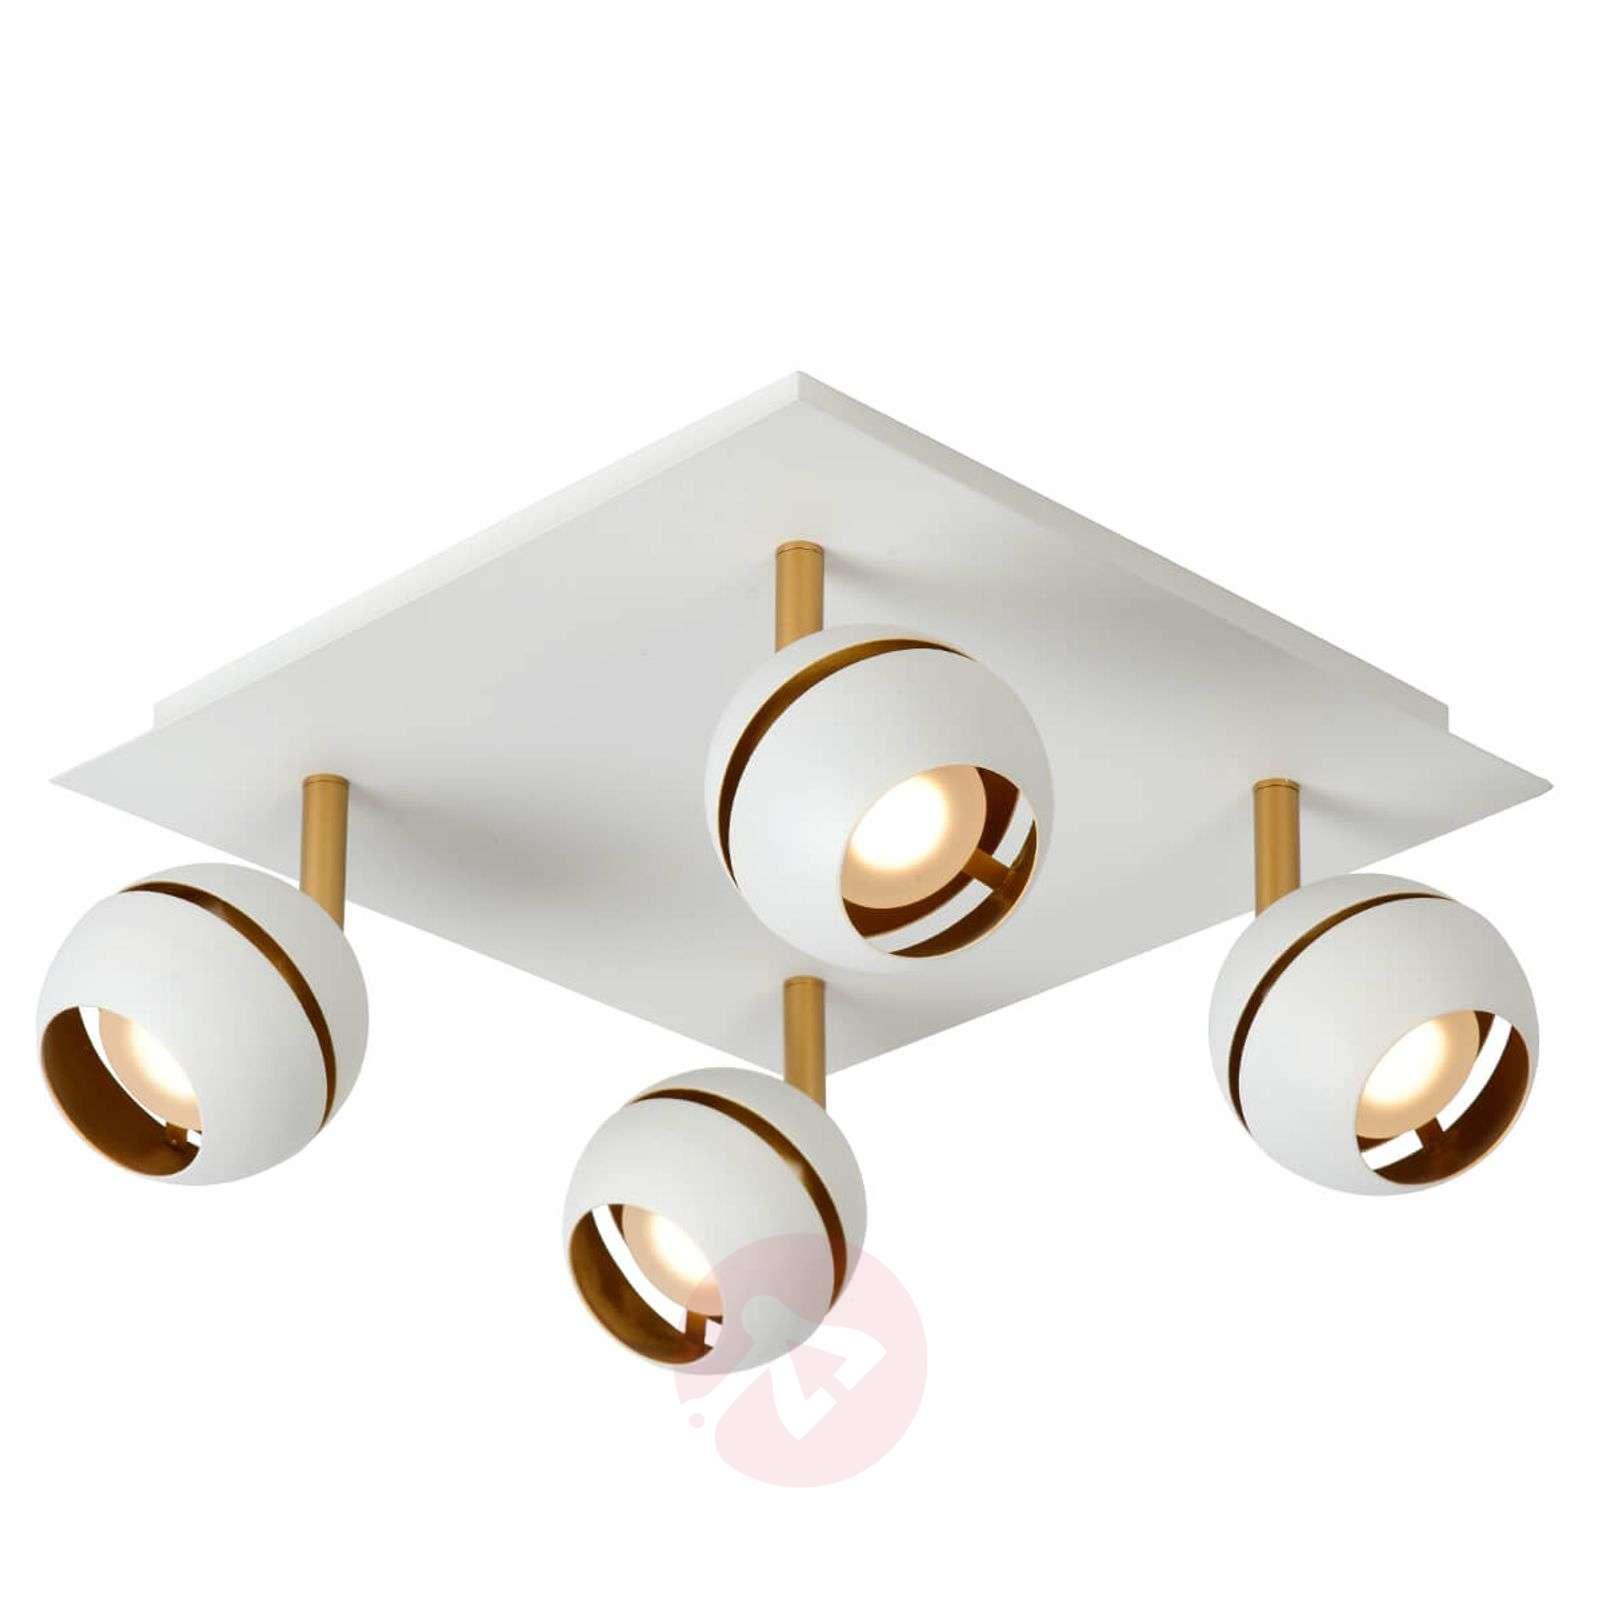 Four-bulb LED ceiling lamp Binari in white-6055233-01